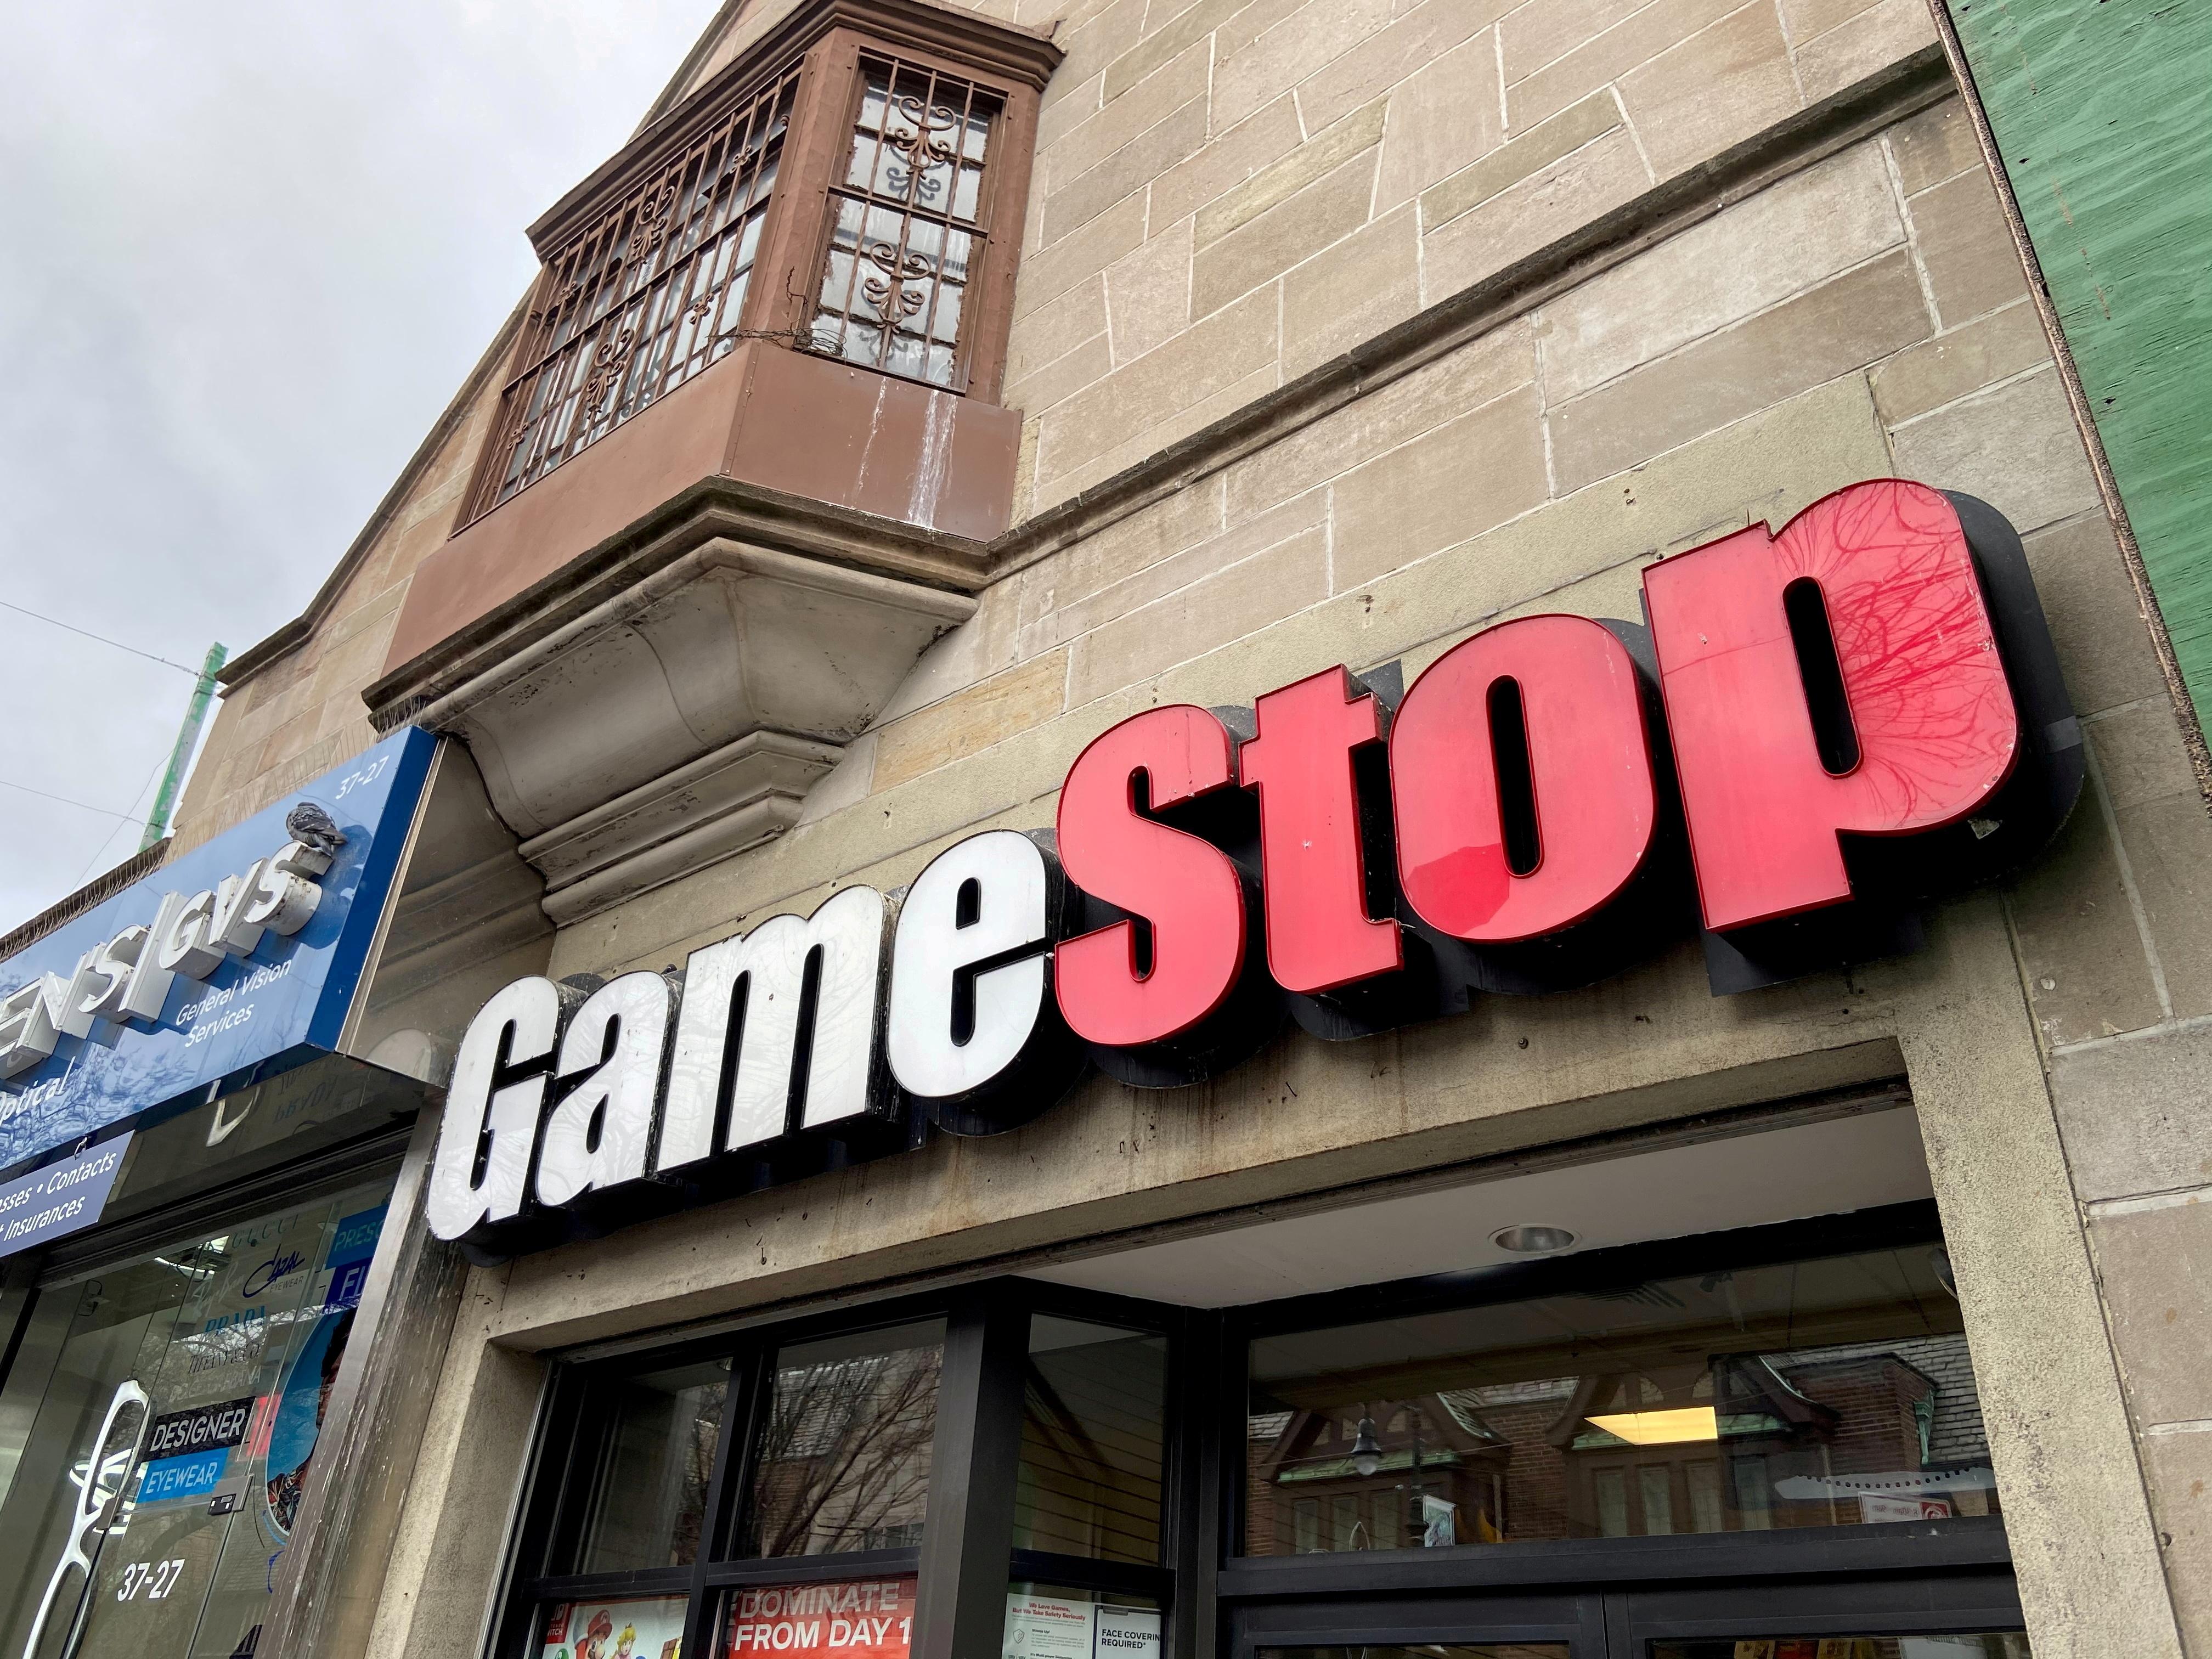 A GameStop store is seen in the Jackson Heights neighborhood of New York City, New York, U.S. January 27, 2021. REUTERS/Nick Zieminski/File Photo